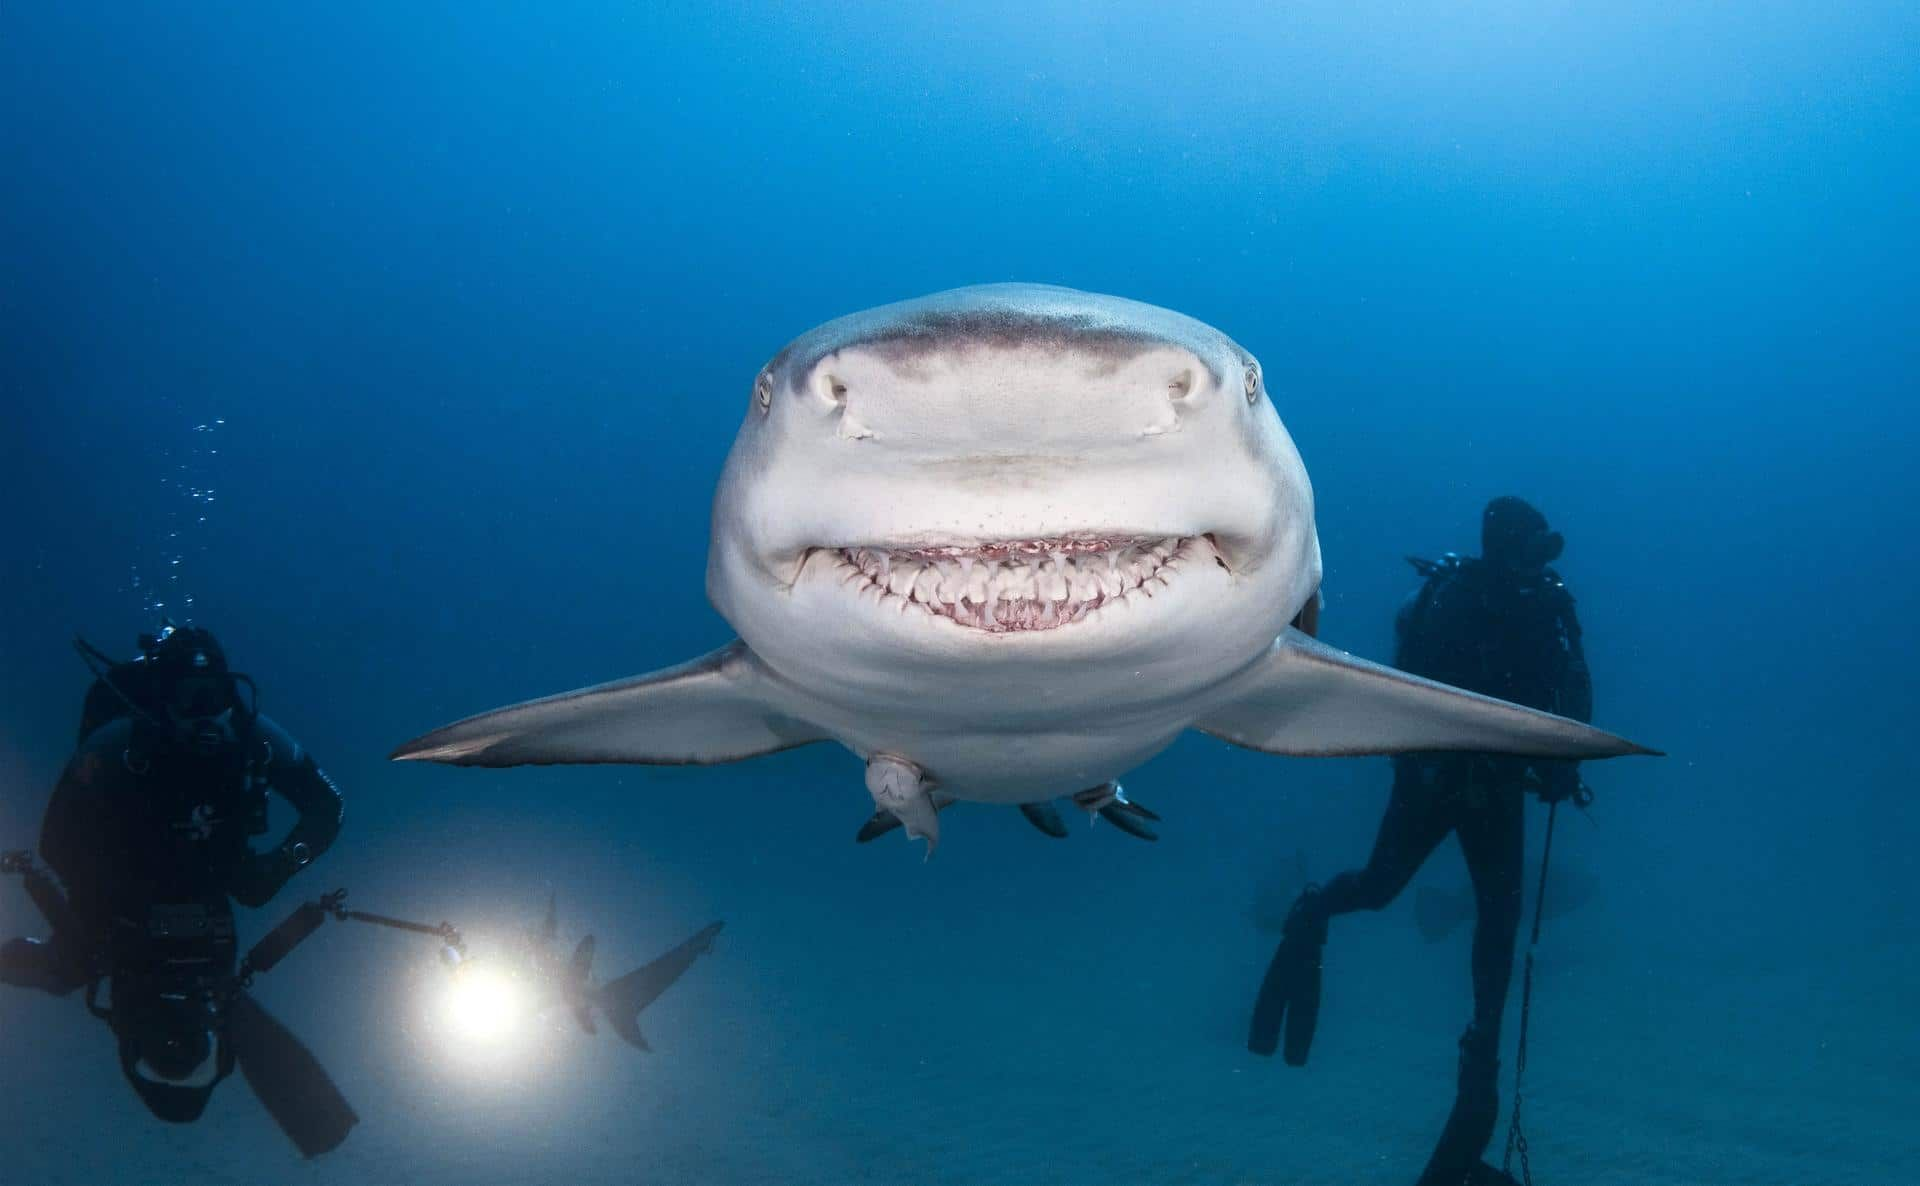 акула прикол картинка первом случае, техника